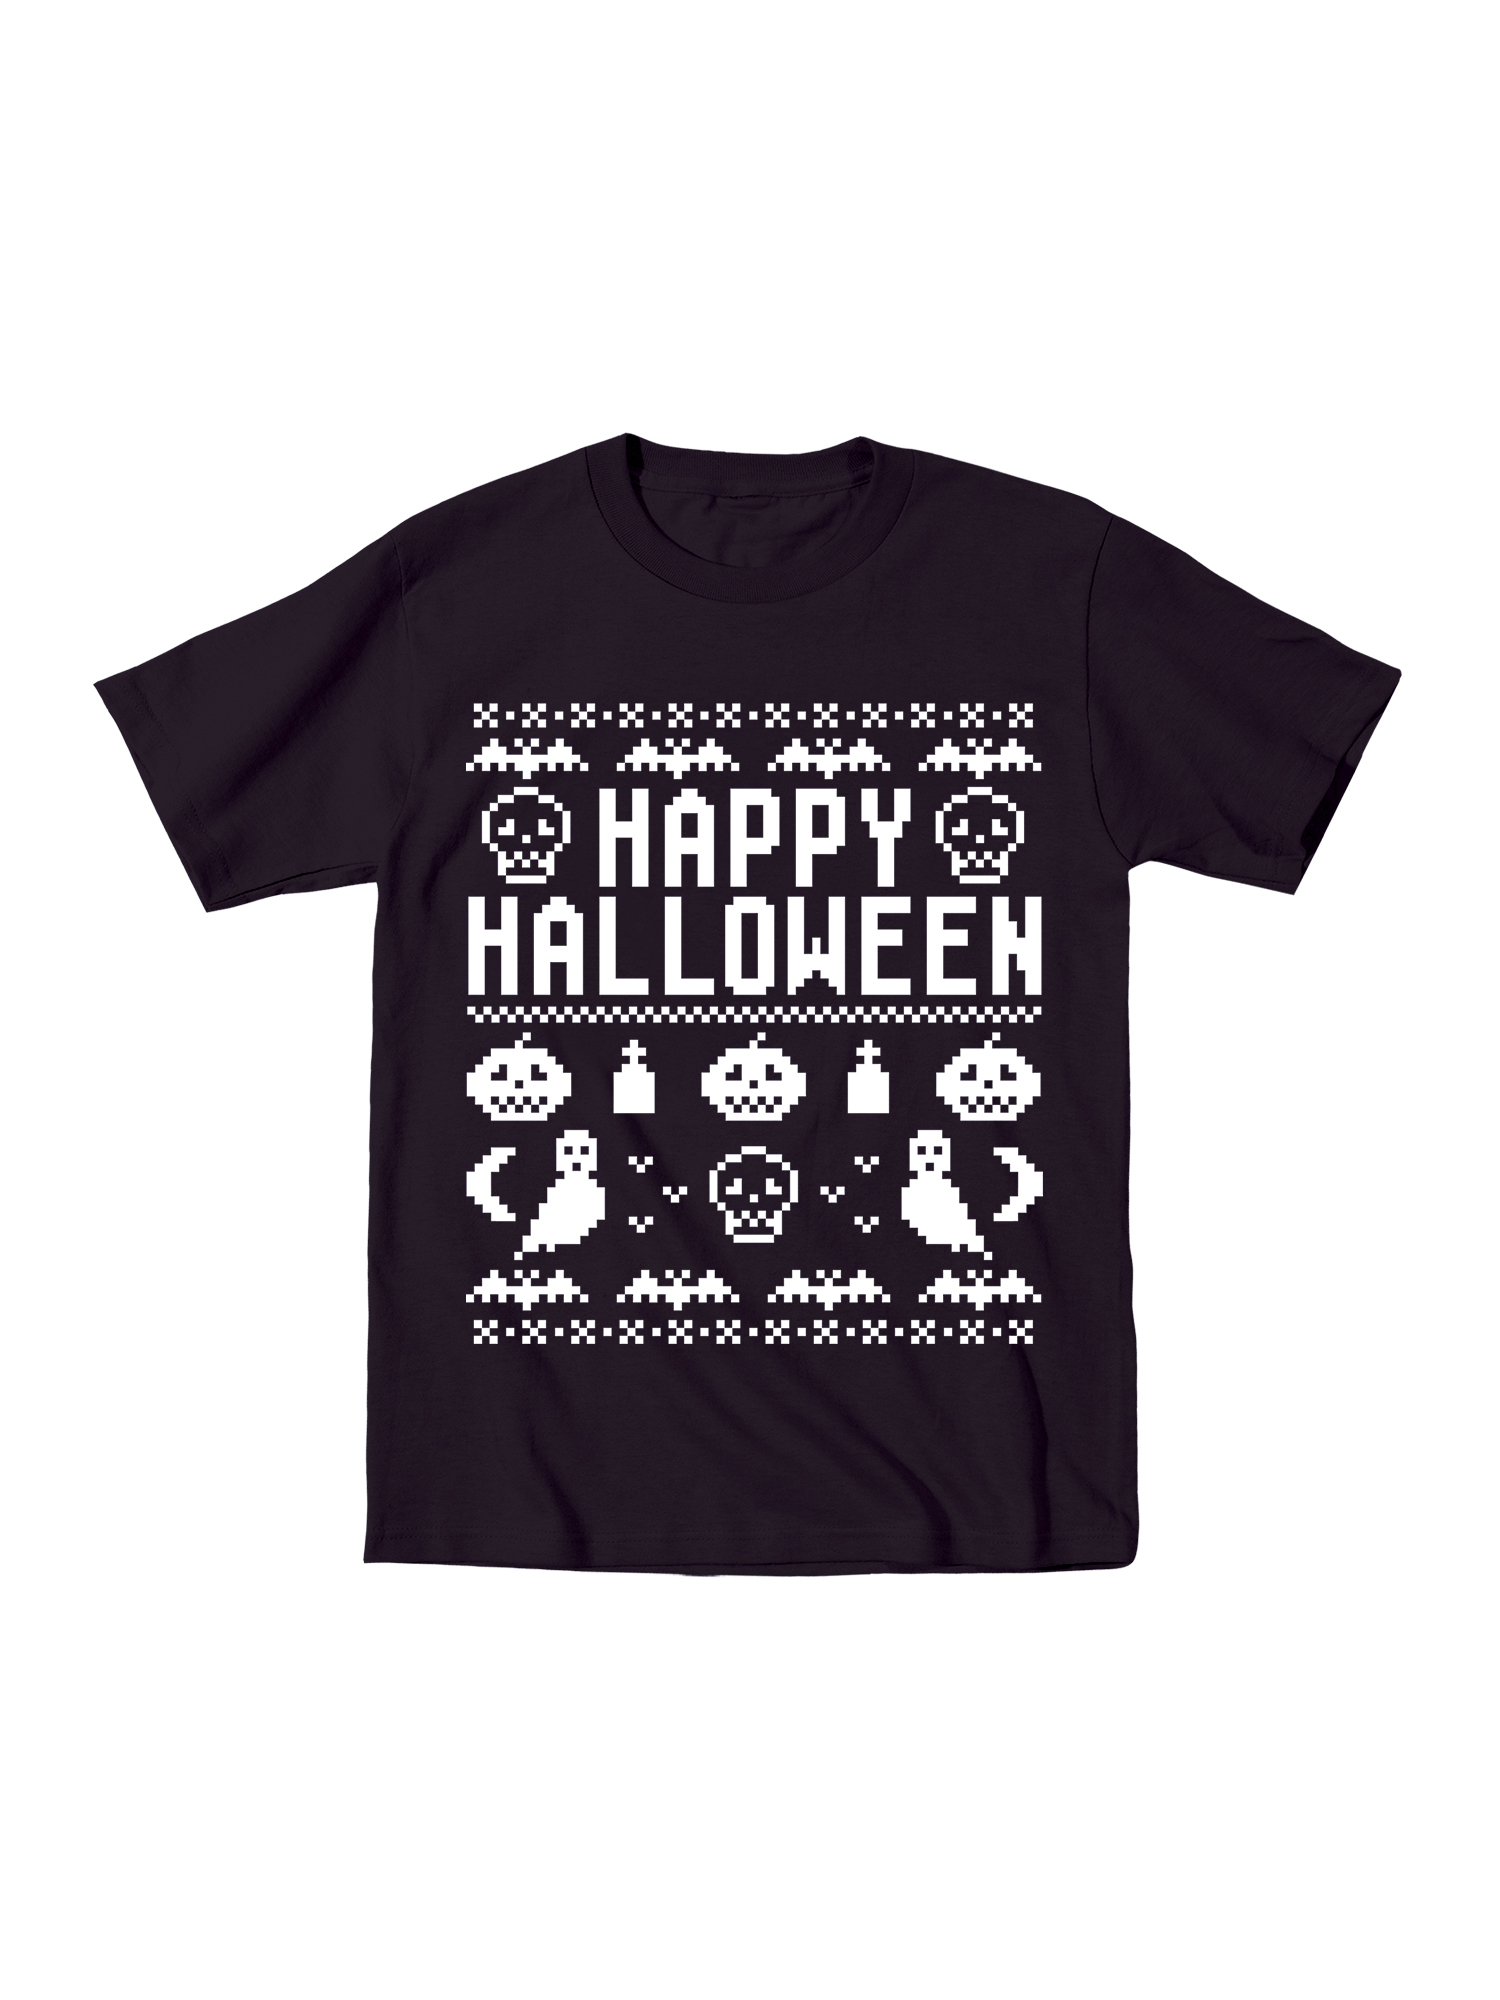 Happy Halloween -CUTE TODDLER SHORT SLEEVE TEE-4T